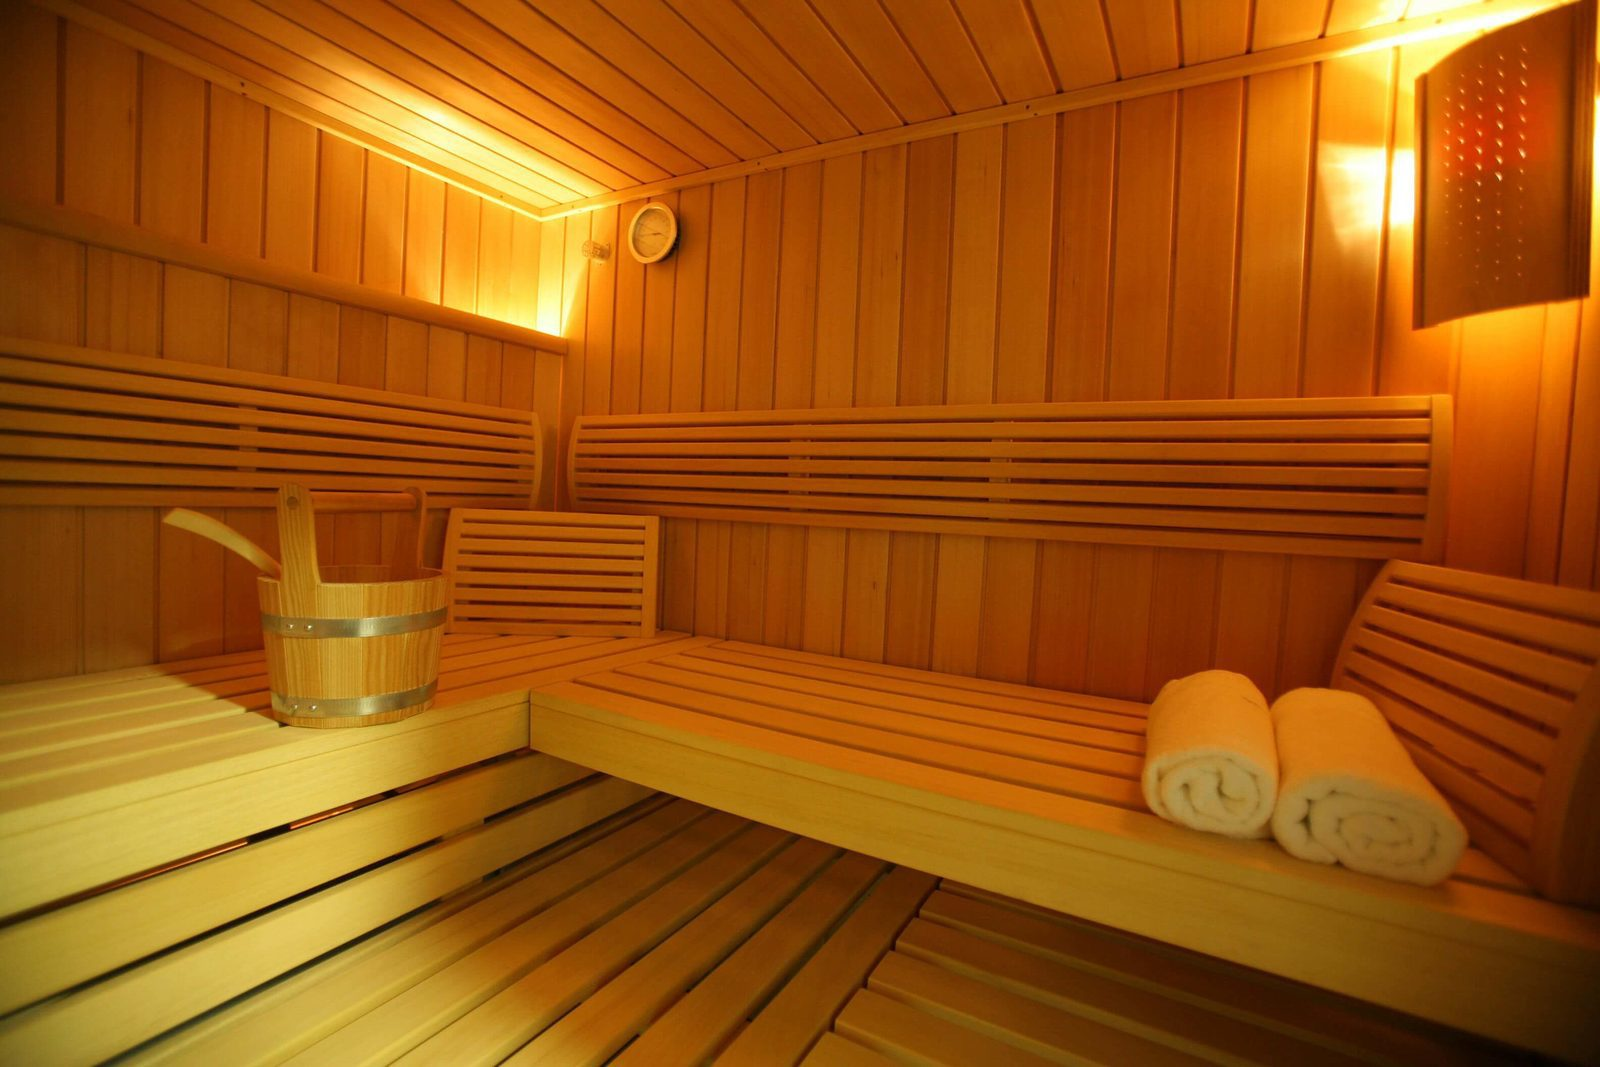 Sauna van landhuis Wielen in Duitsland, Nedersaksen